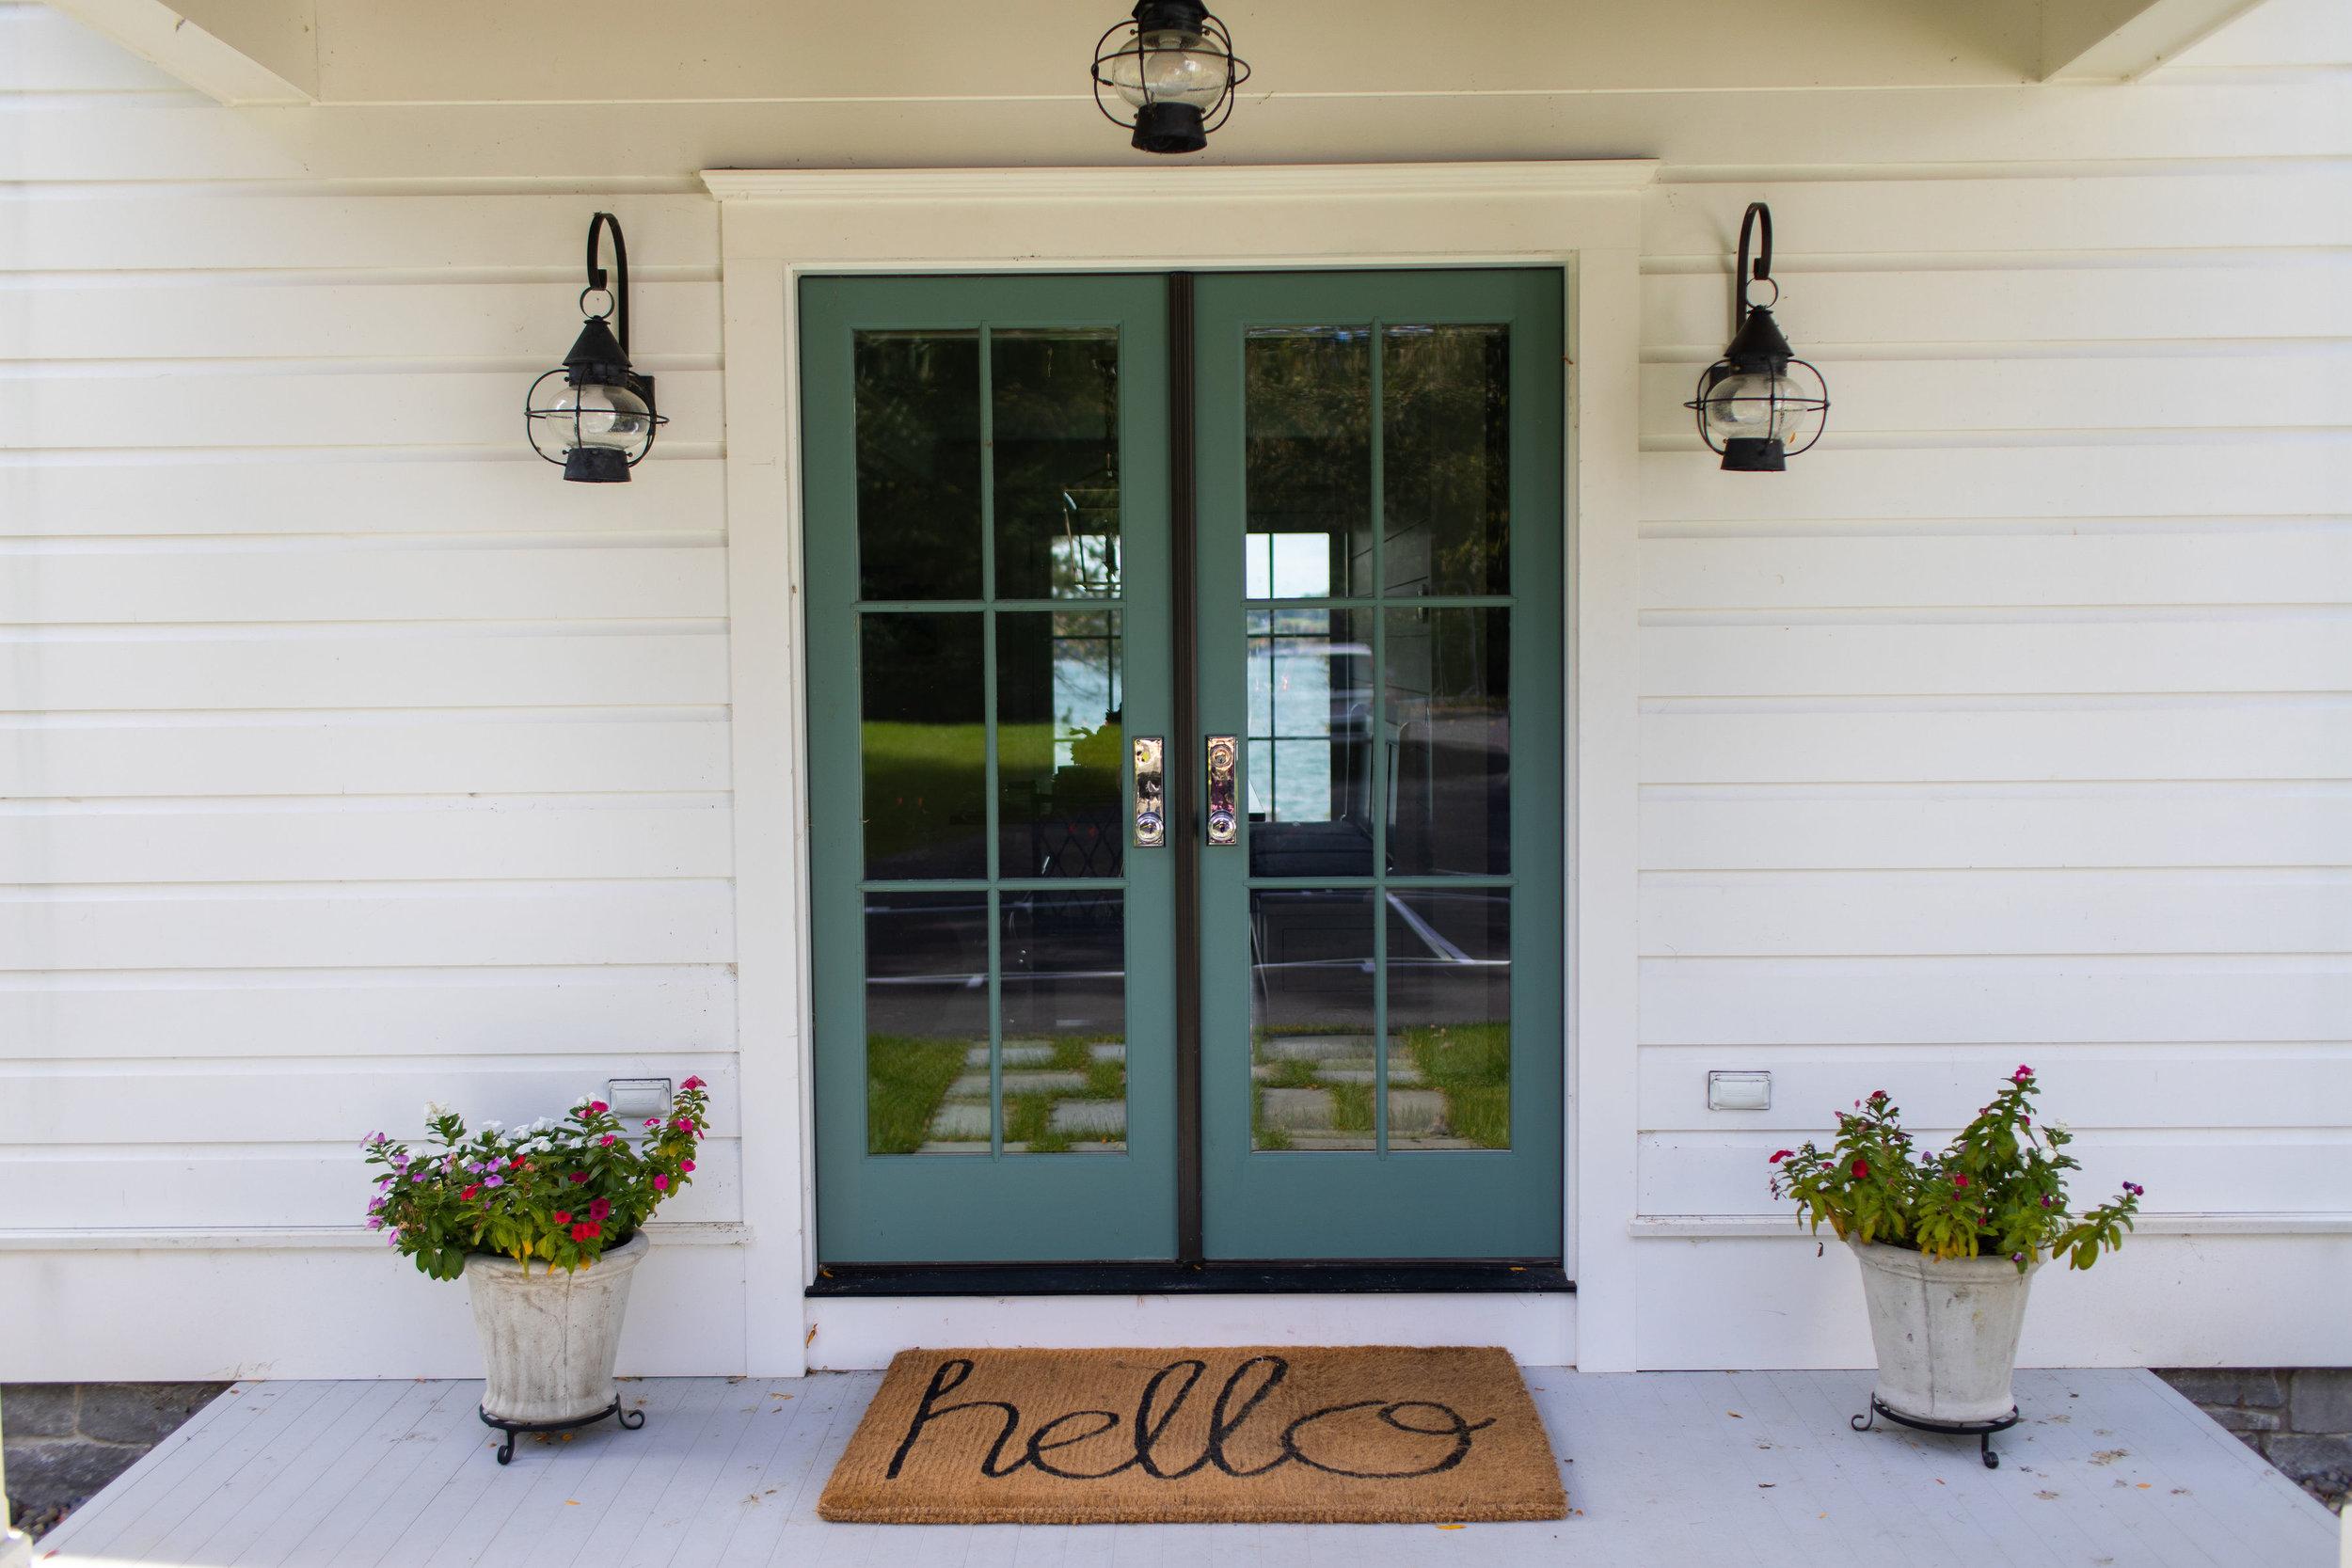 Cottage interior design style - Teaselwood Design, Skaneateles, NY